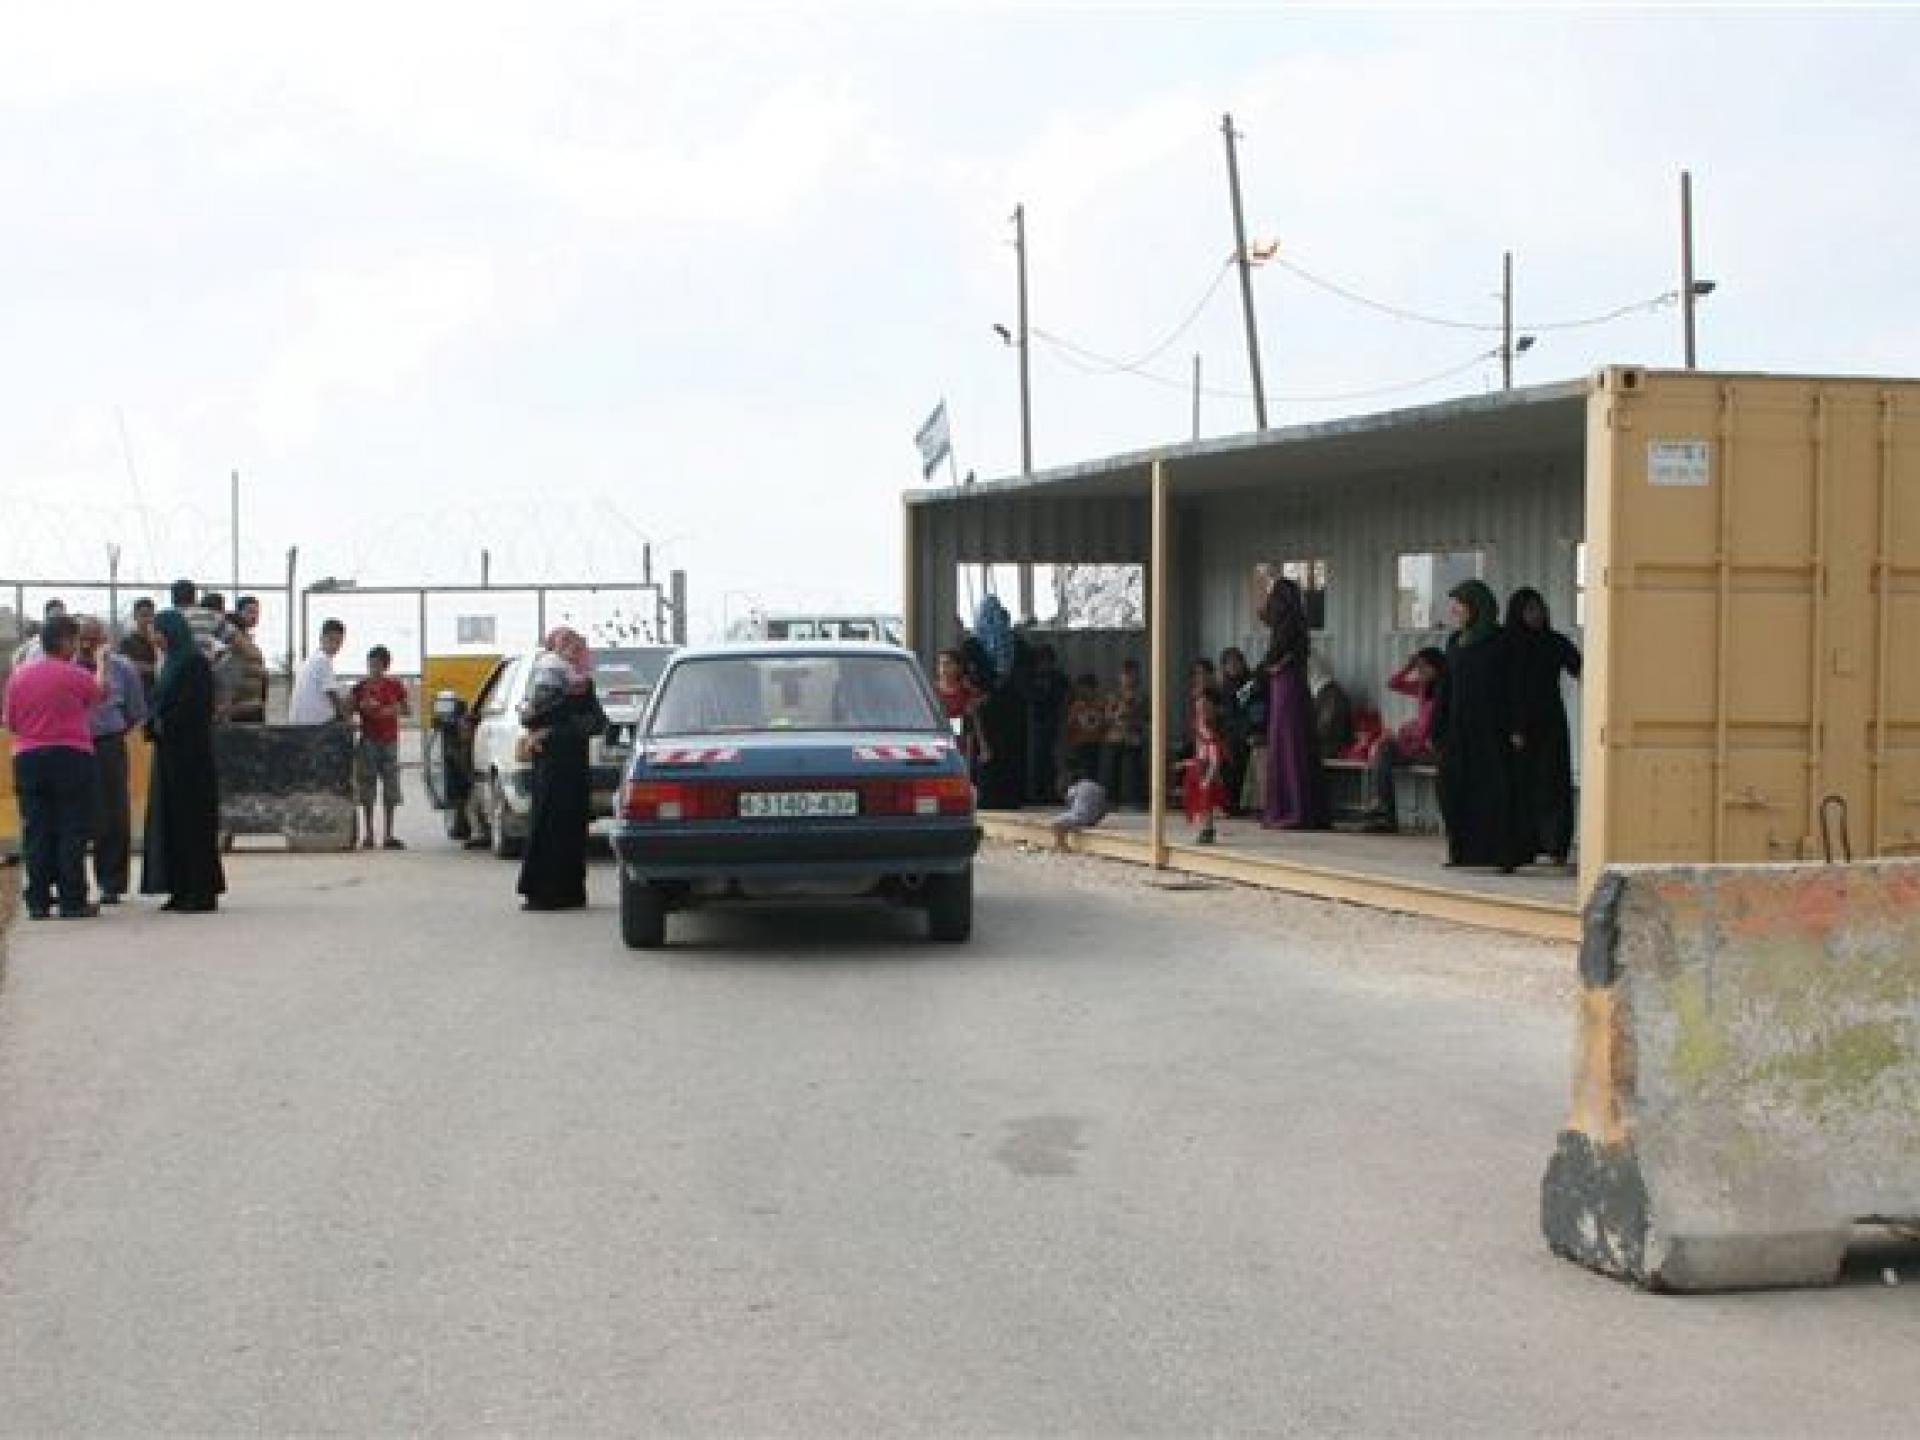 Tura/Shaked checkpoint 10.07.10